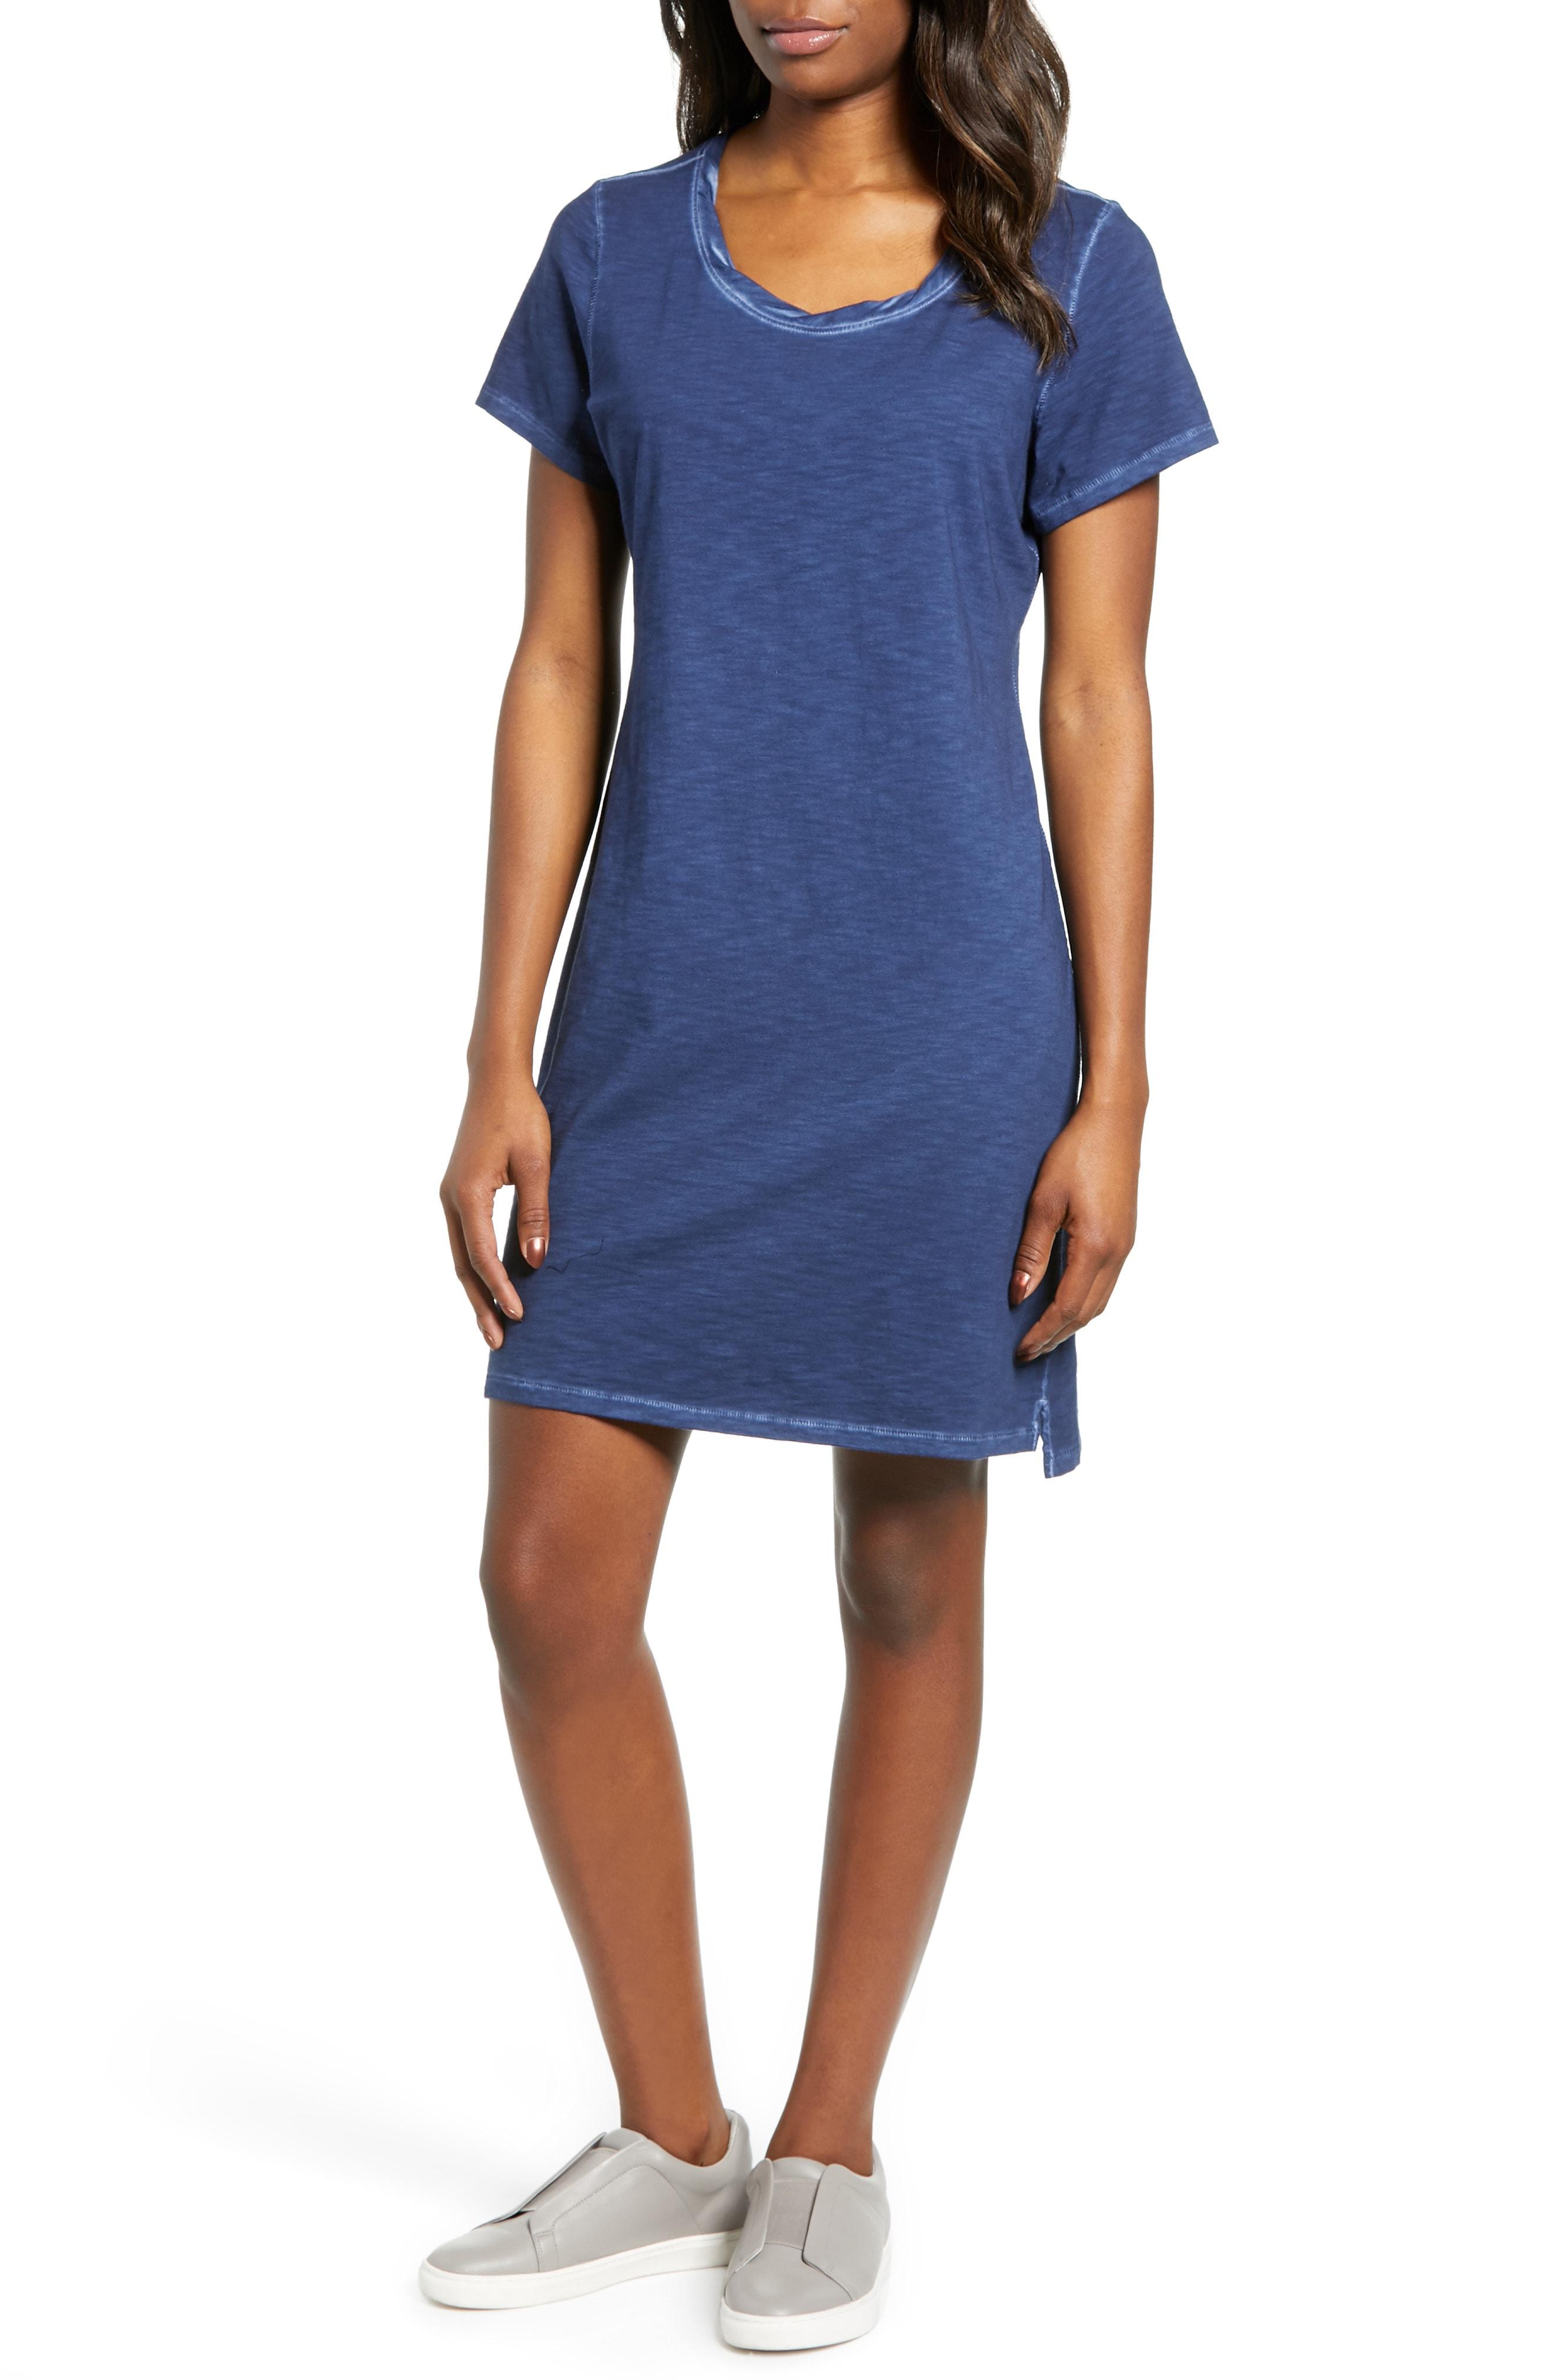 Tommy Bahama Sunshine Twist Tee Dress